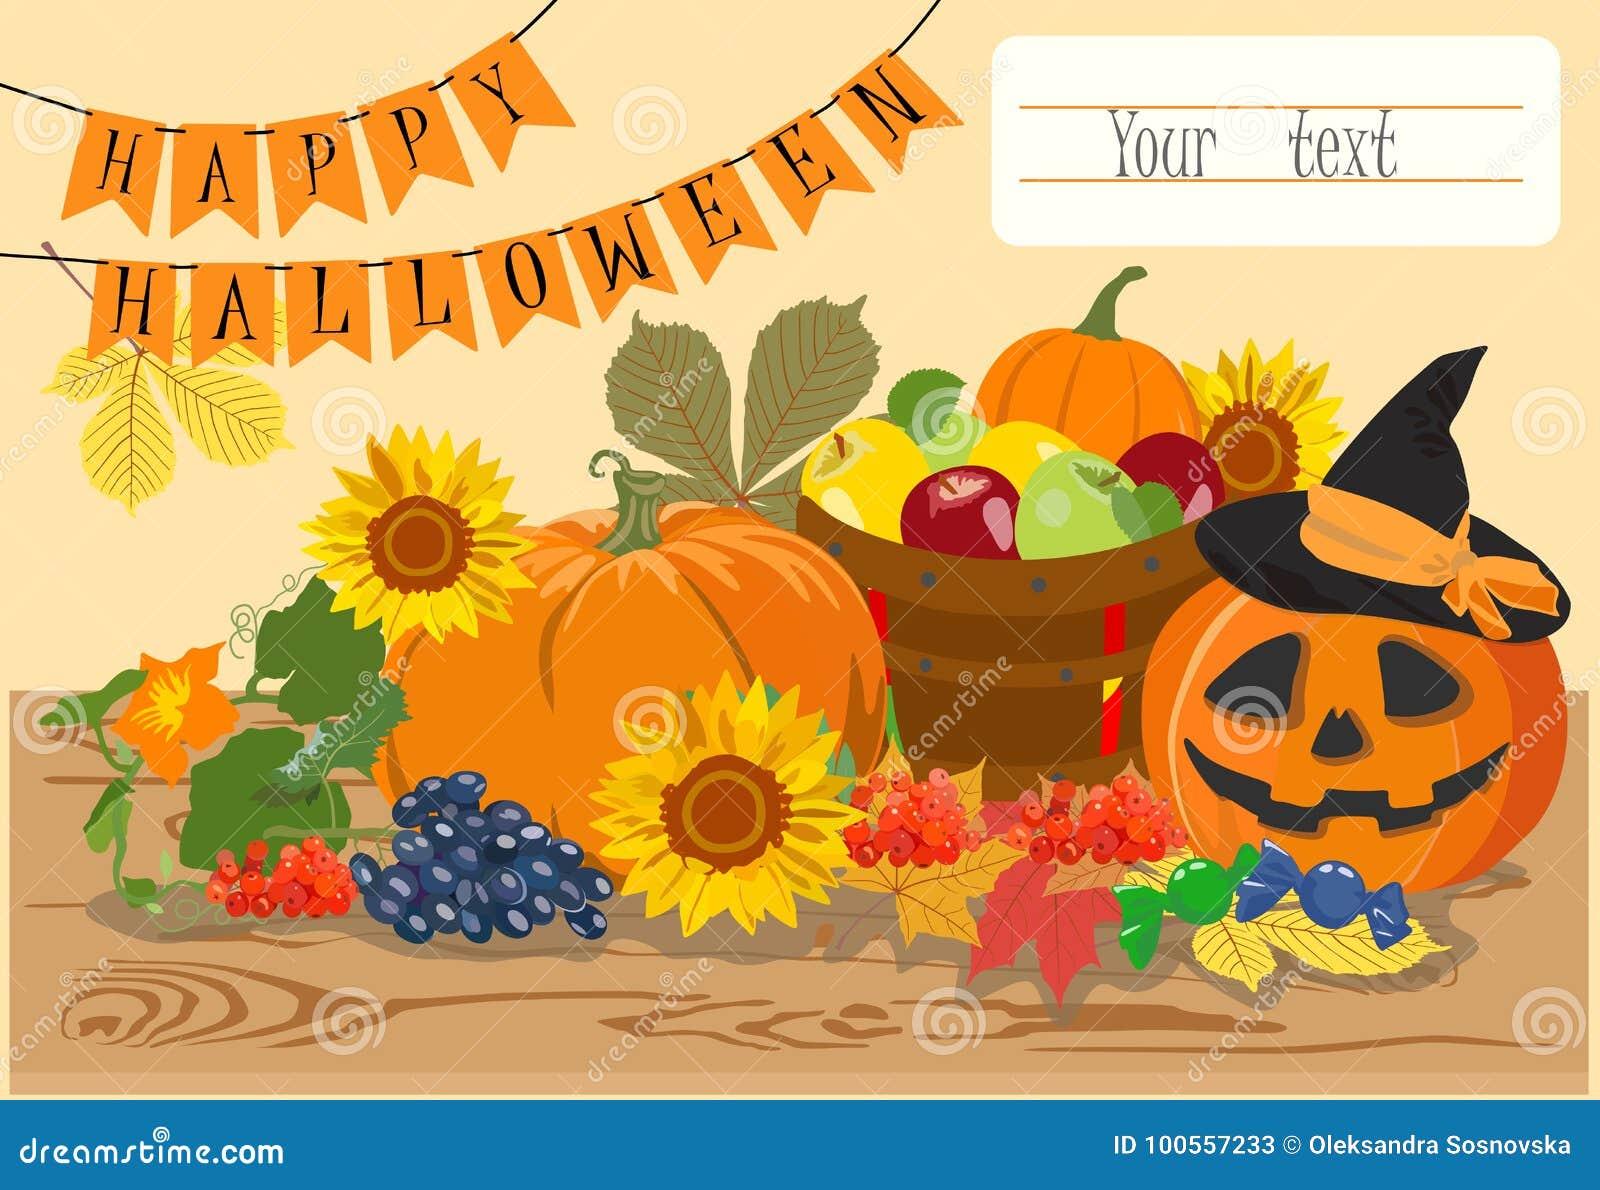 Happy halloween message design background vector illustration stock happy halloween message design background vector illustration m4hsunfo